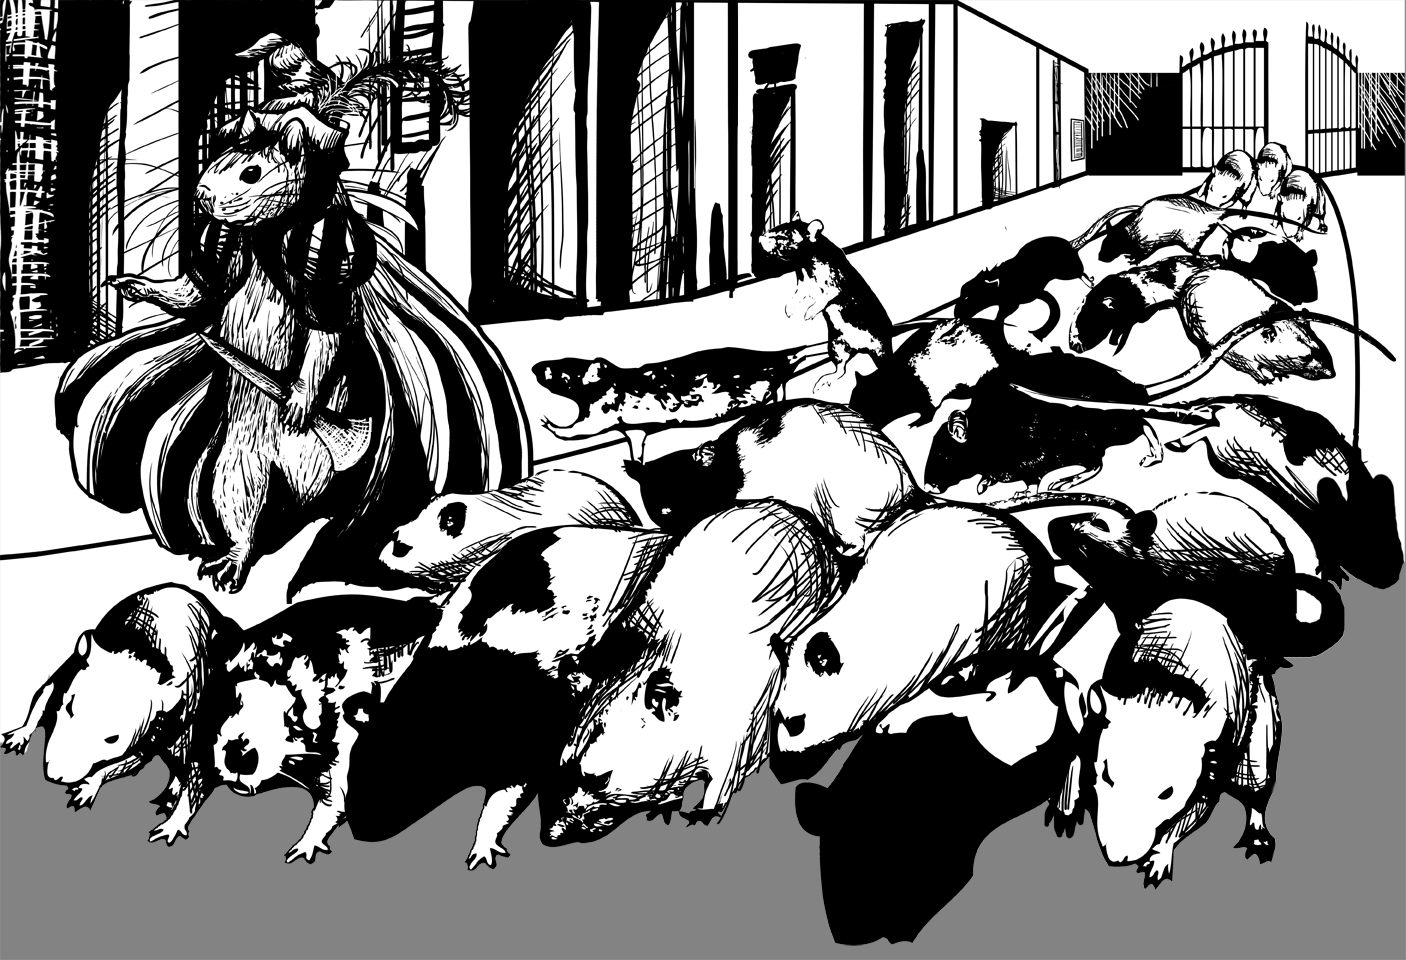 Drawn rat art Very the through open Digital